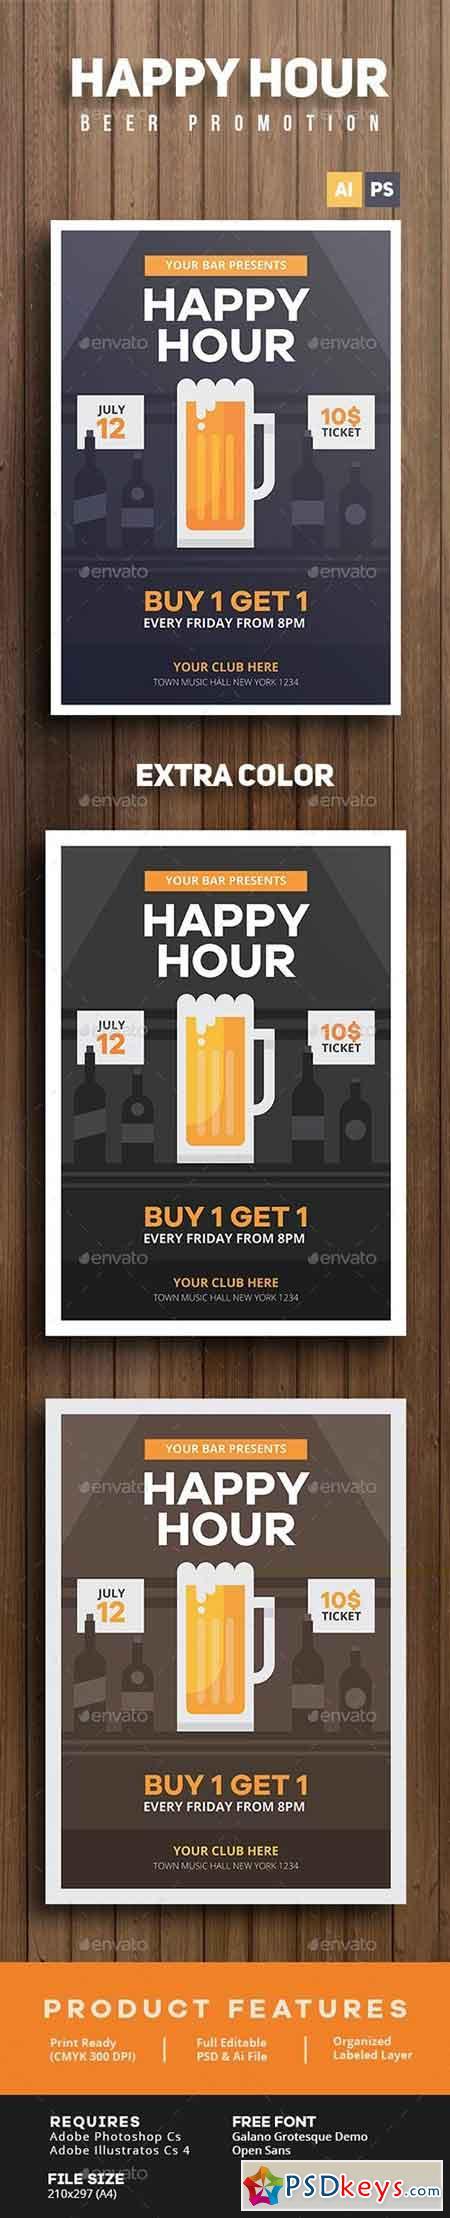 Happy Hour Beer Promotion Flyer 14265779